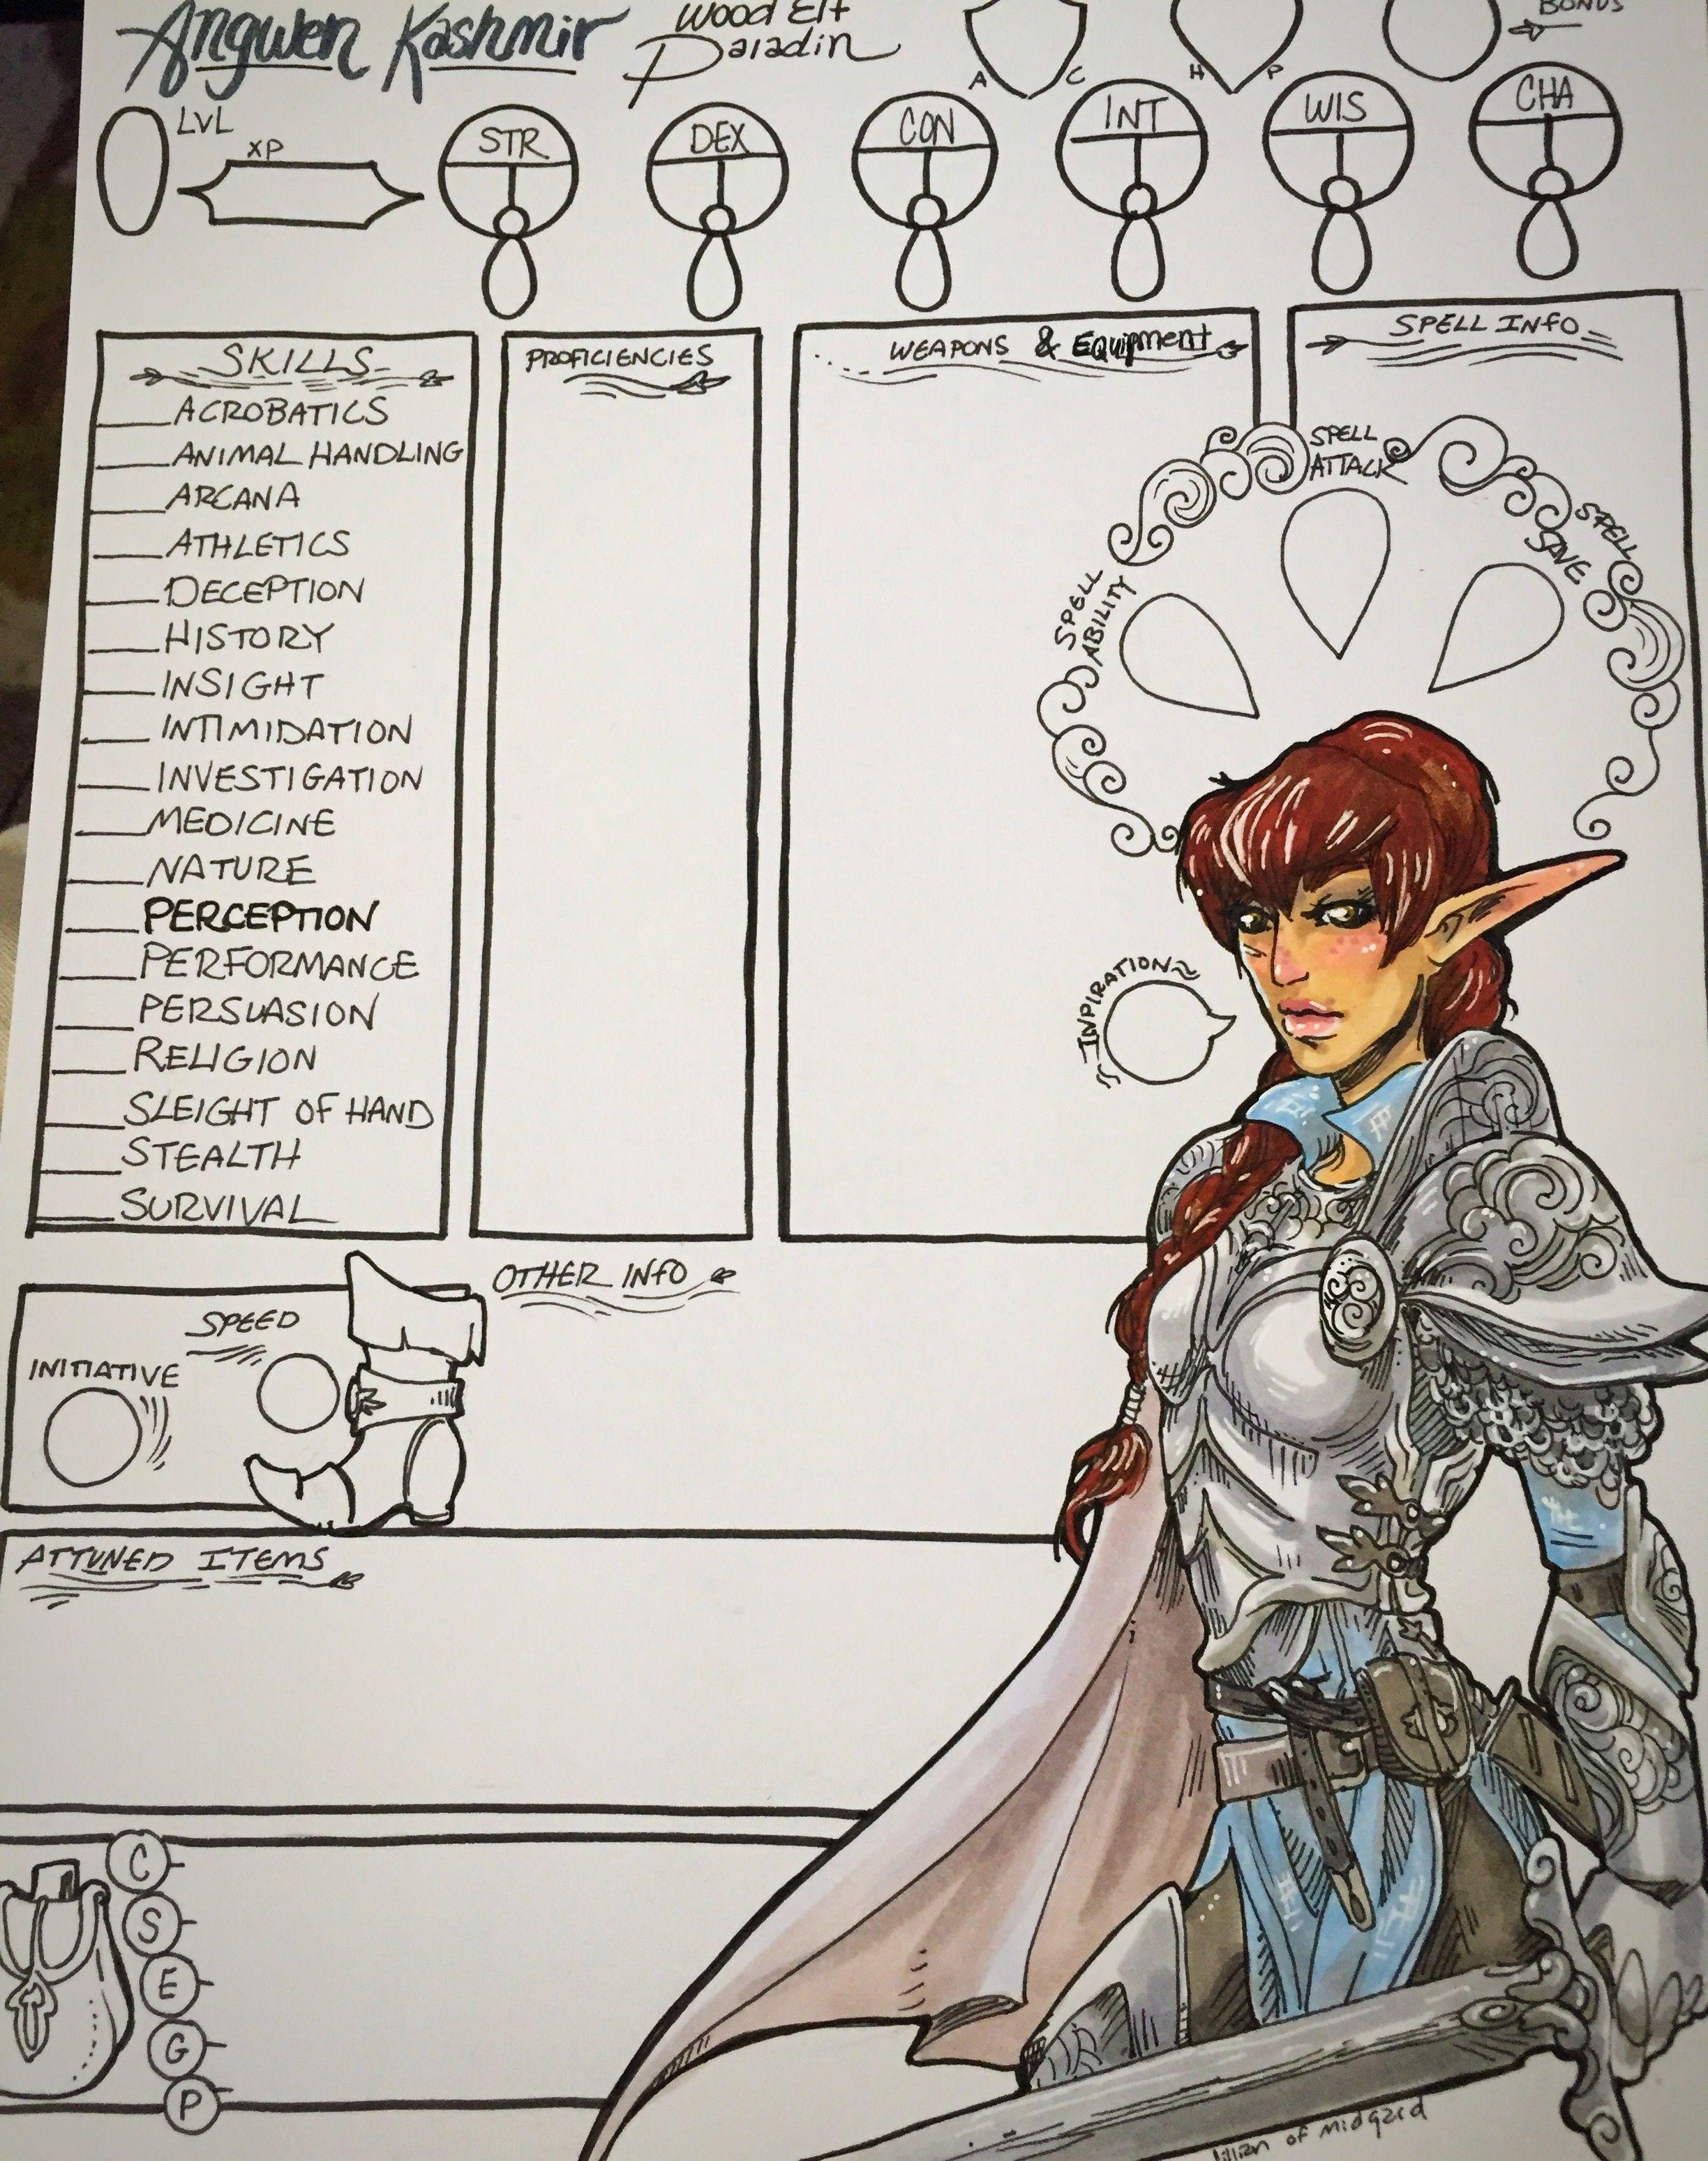 jillian of midgard custom illustrated d d 5th edition character